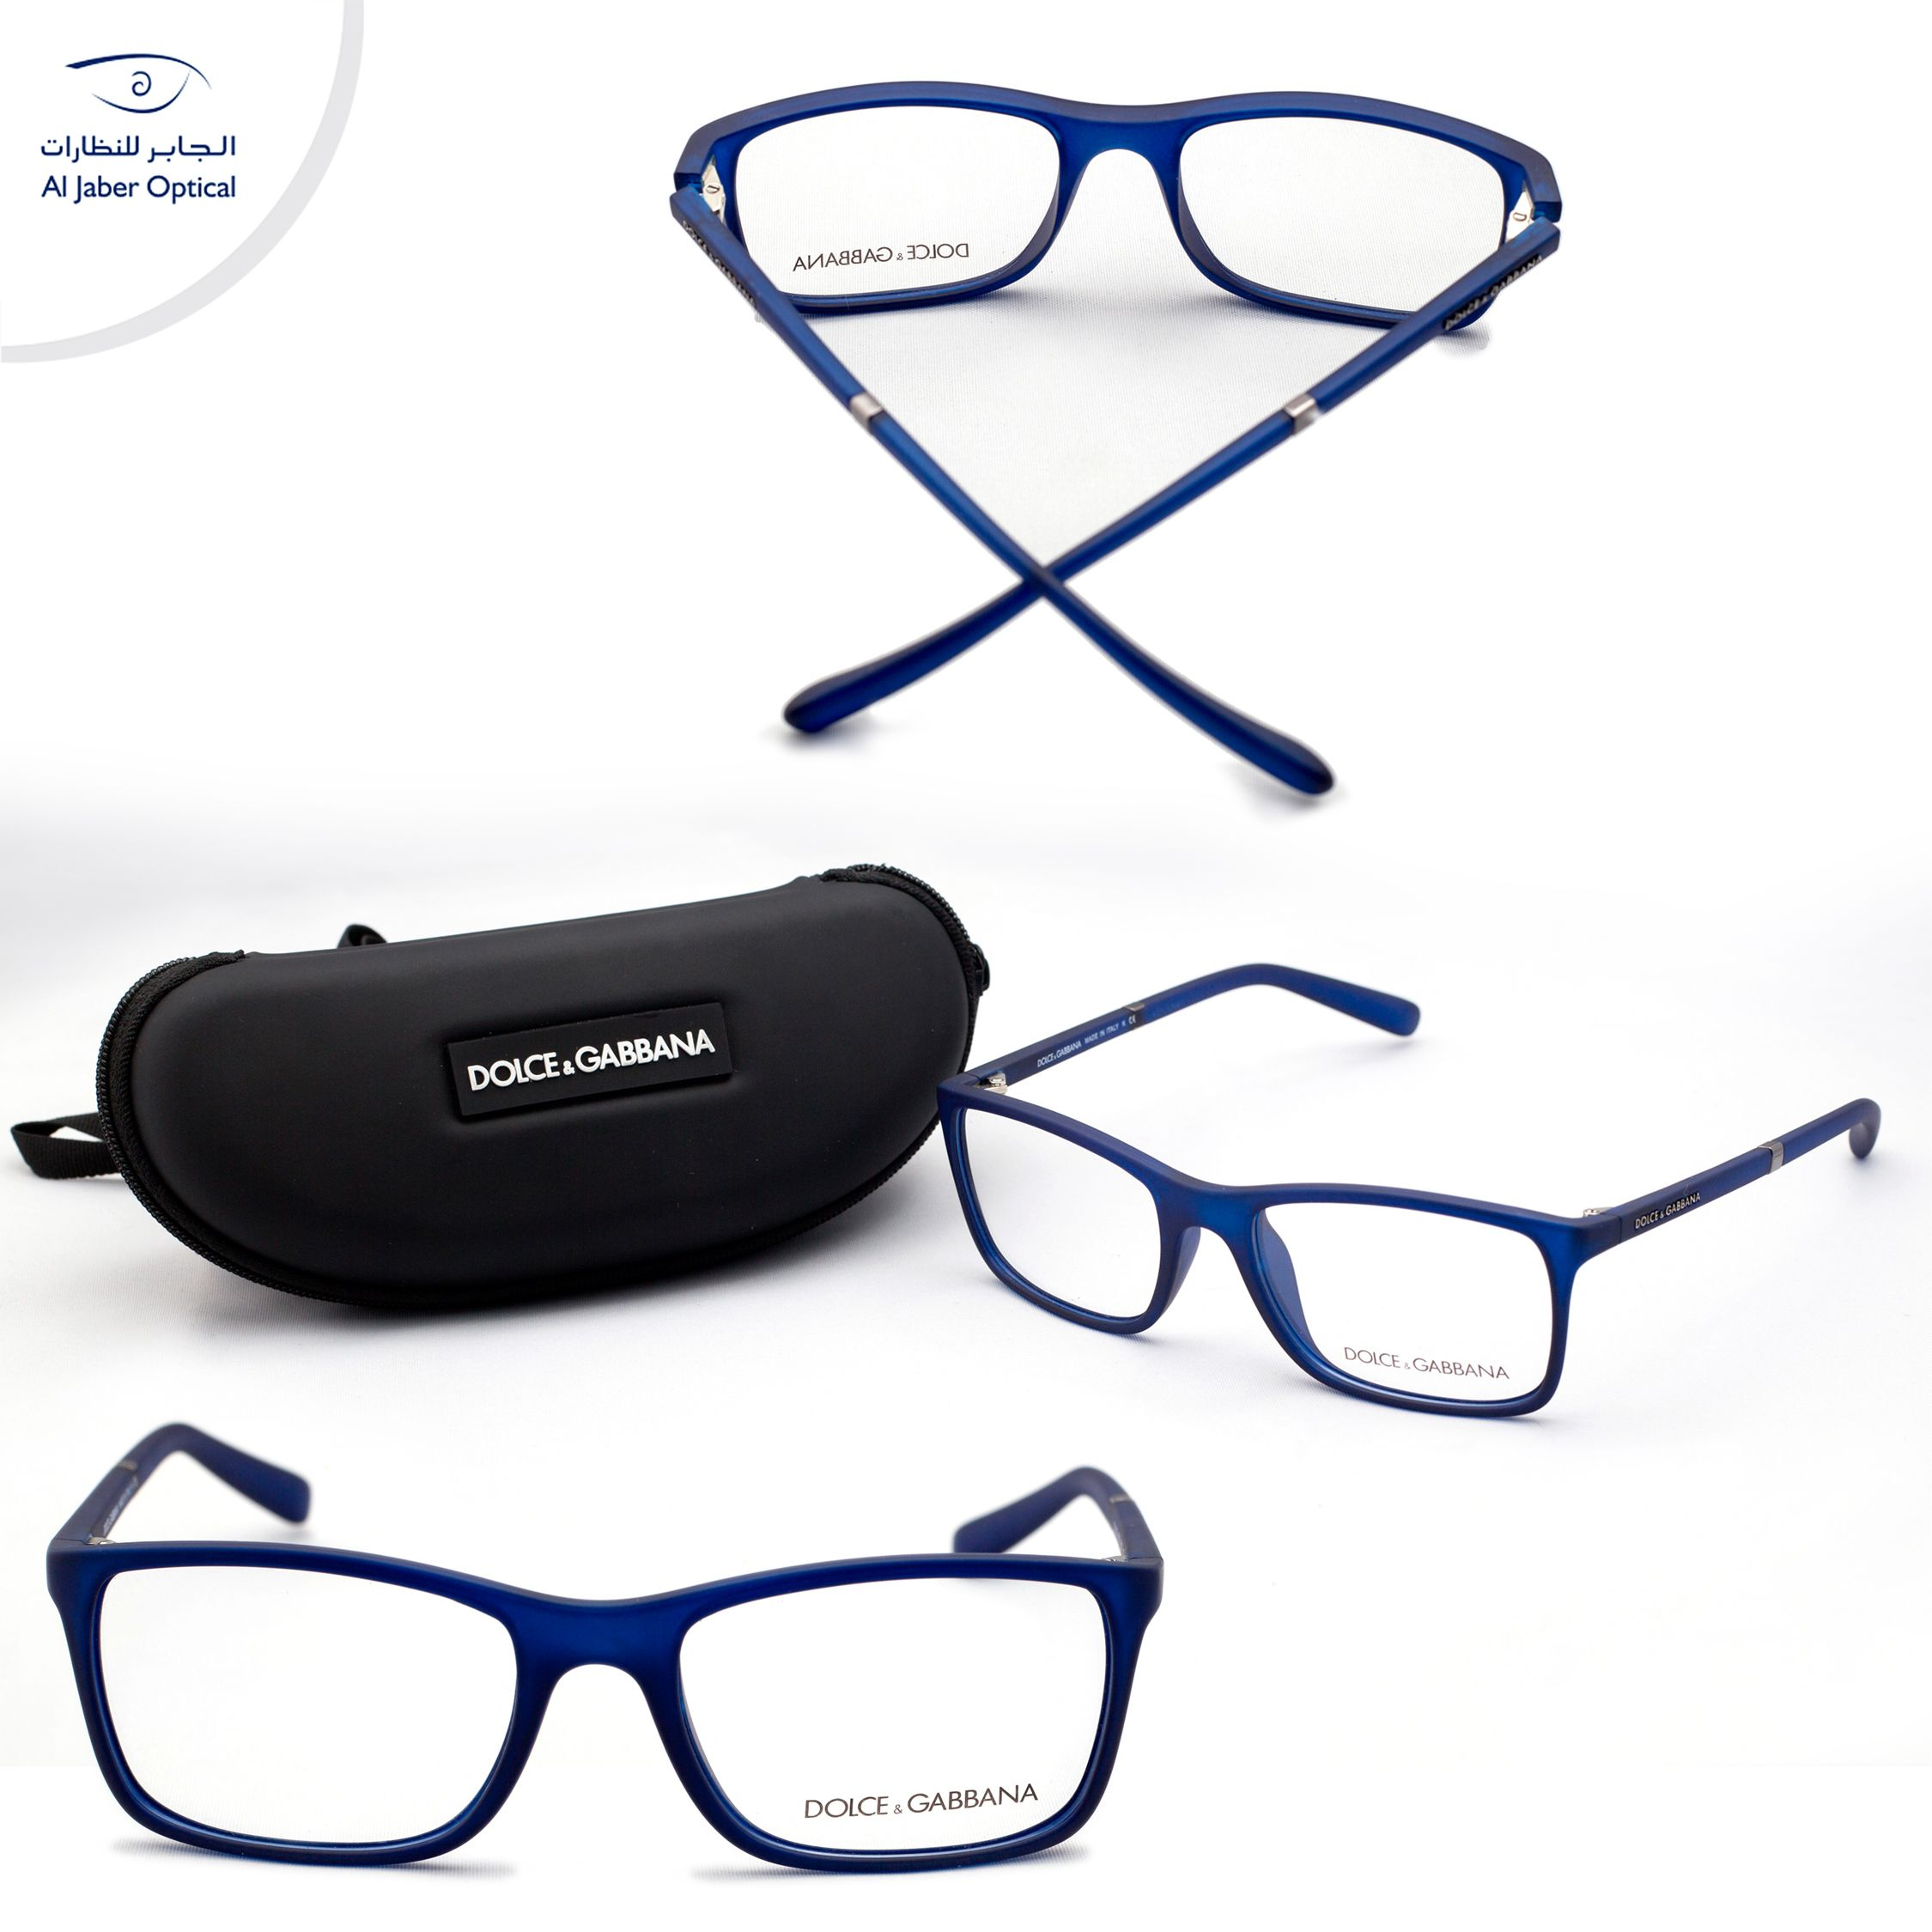 Think Smart Look Smart Dolcegabbana فكر بذكاء و أظهر ذكائك Aljaber Optical Dolcegabbana Eyewear Eyeglasse Dolce And Gabbana Sunglasses Case Dolce